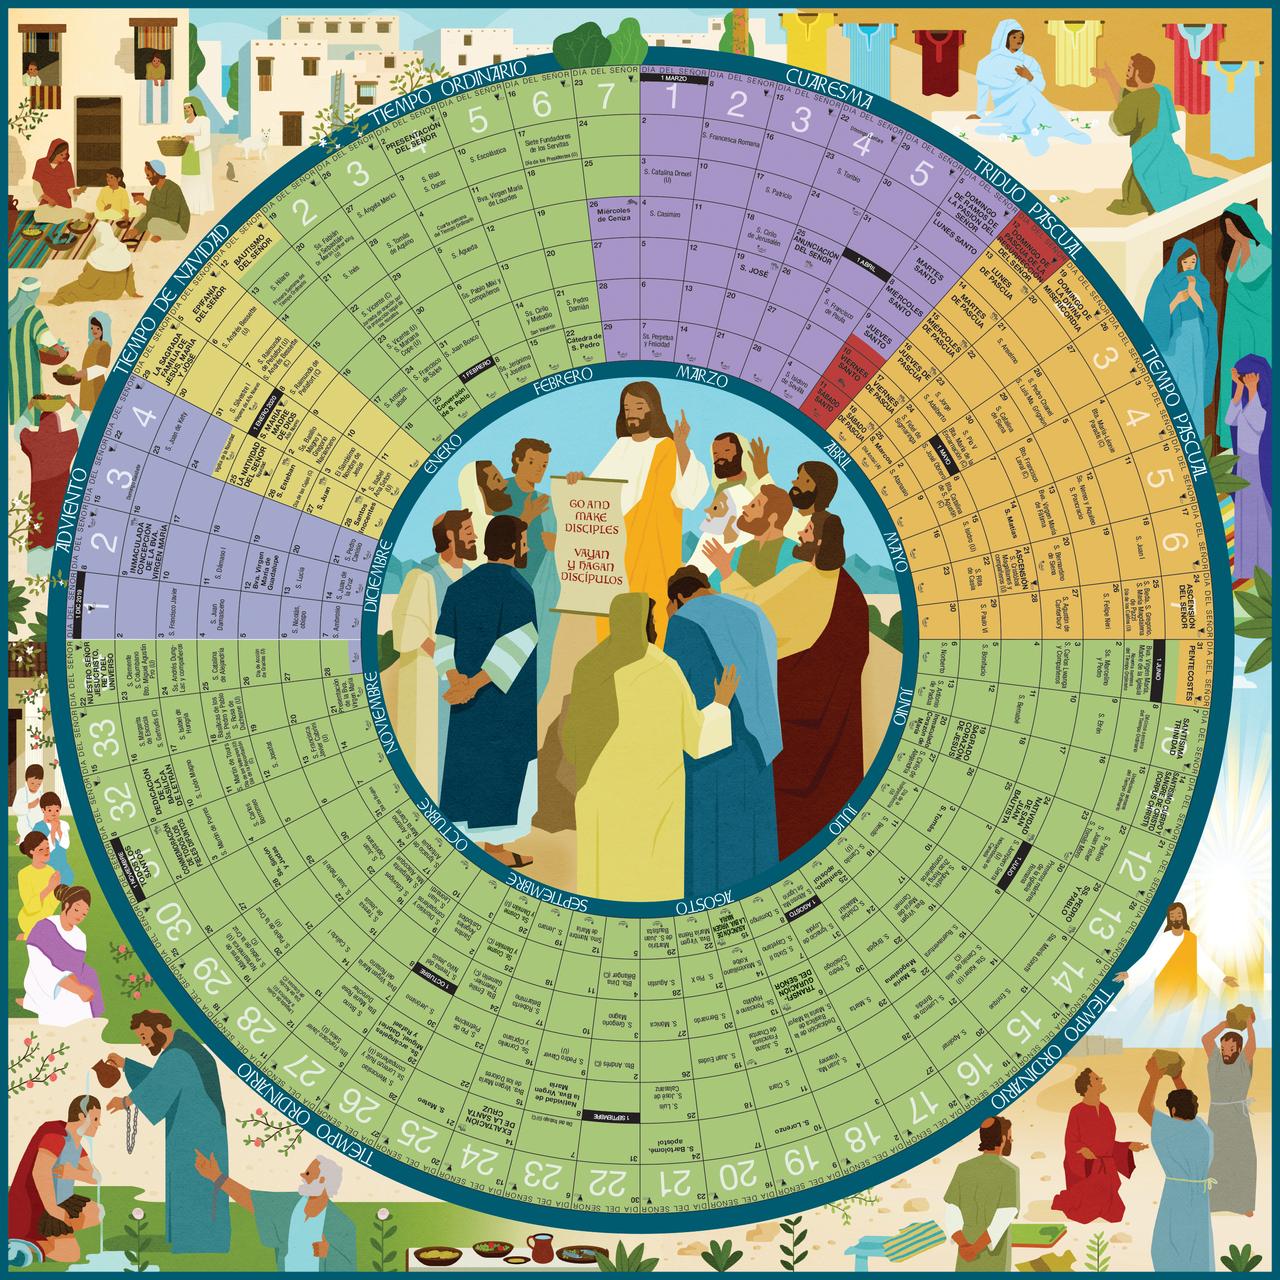 Calendario Liturgico Romano 2020.2020 El Ano De Gracia Liturgical Calendar Spanish Poster 26 X 26